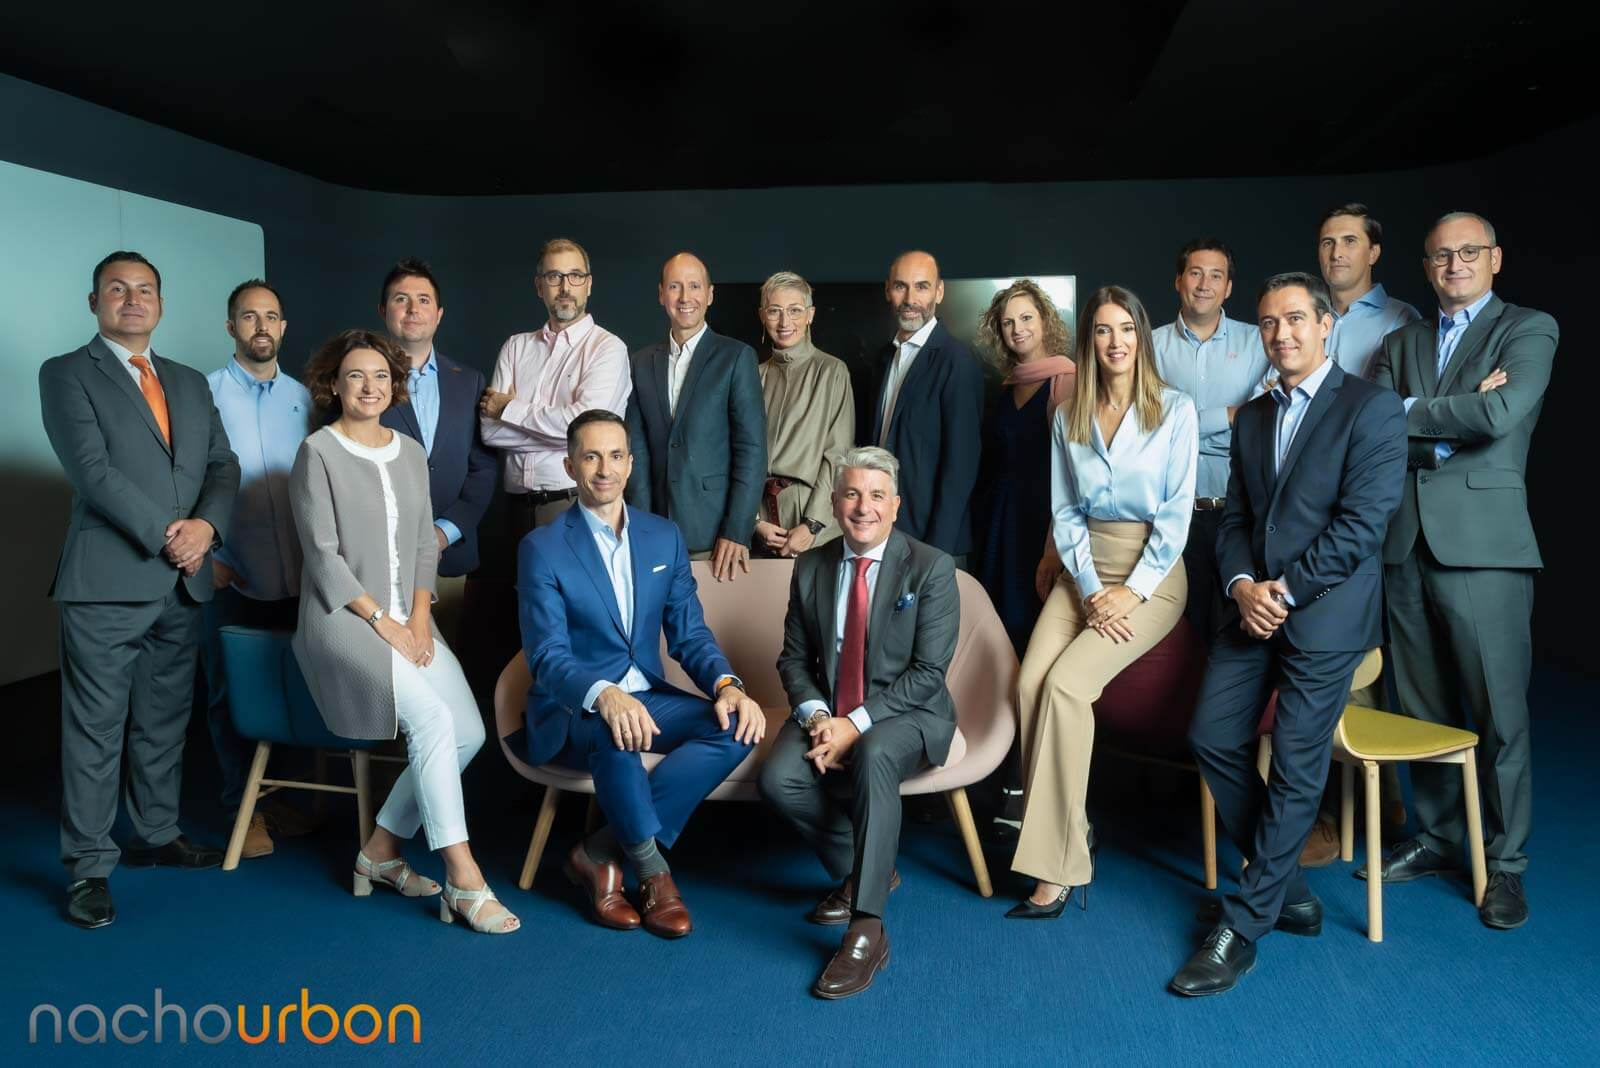 retratos grupo grande corporativo especialista